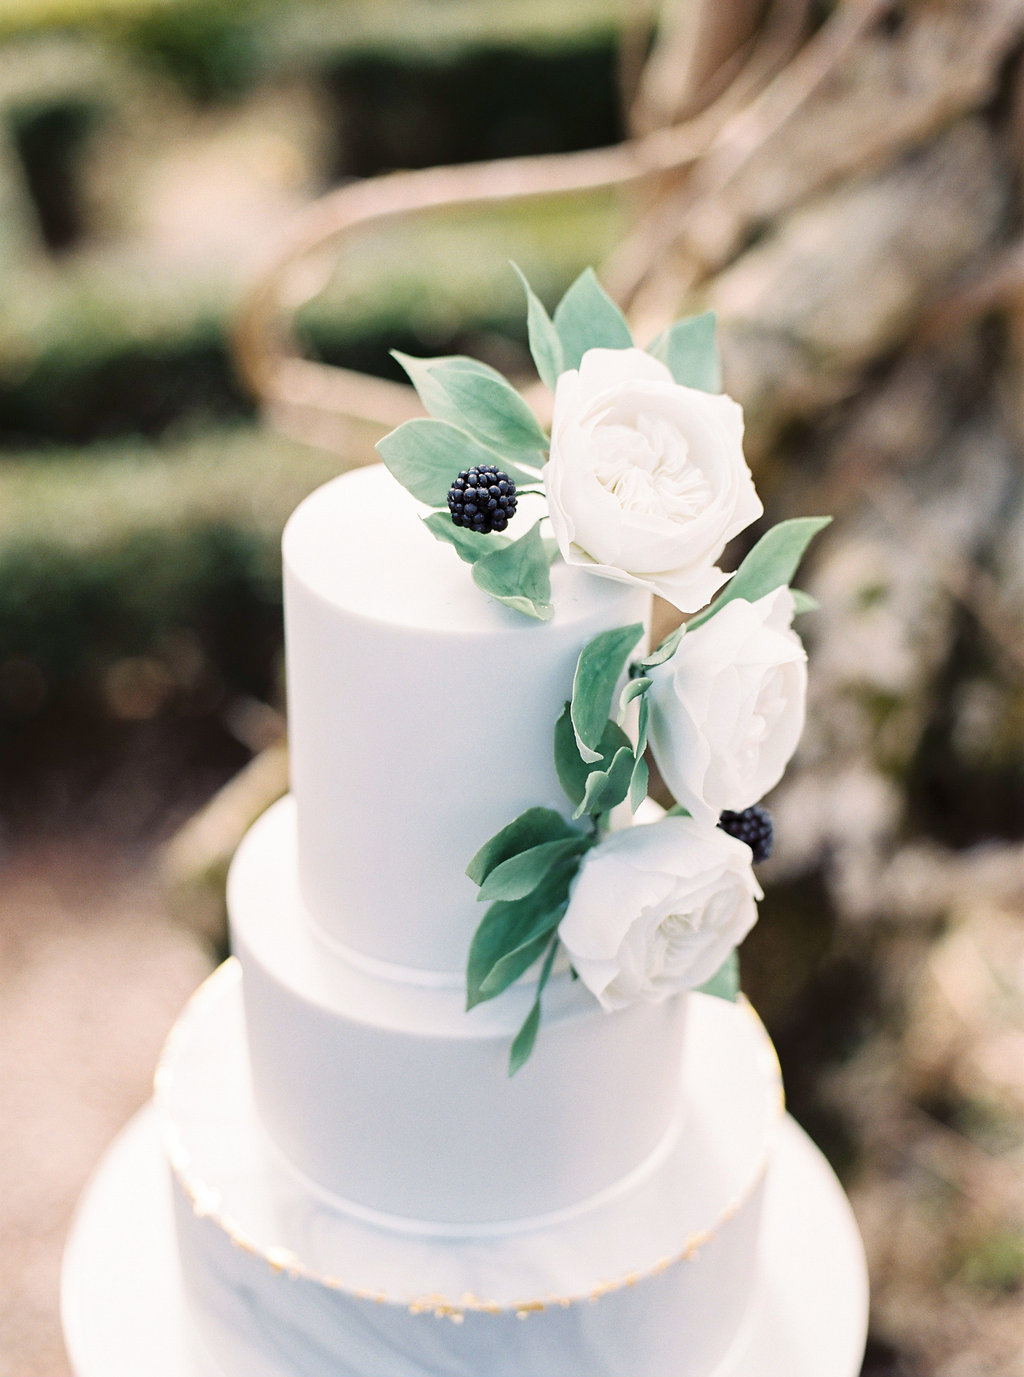 WeddingSparrow-PhotographybyIntoTheLight-Macias-lordan.com-ONLINESHARING(30of50).jpg